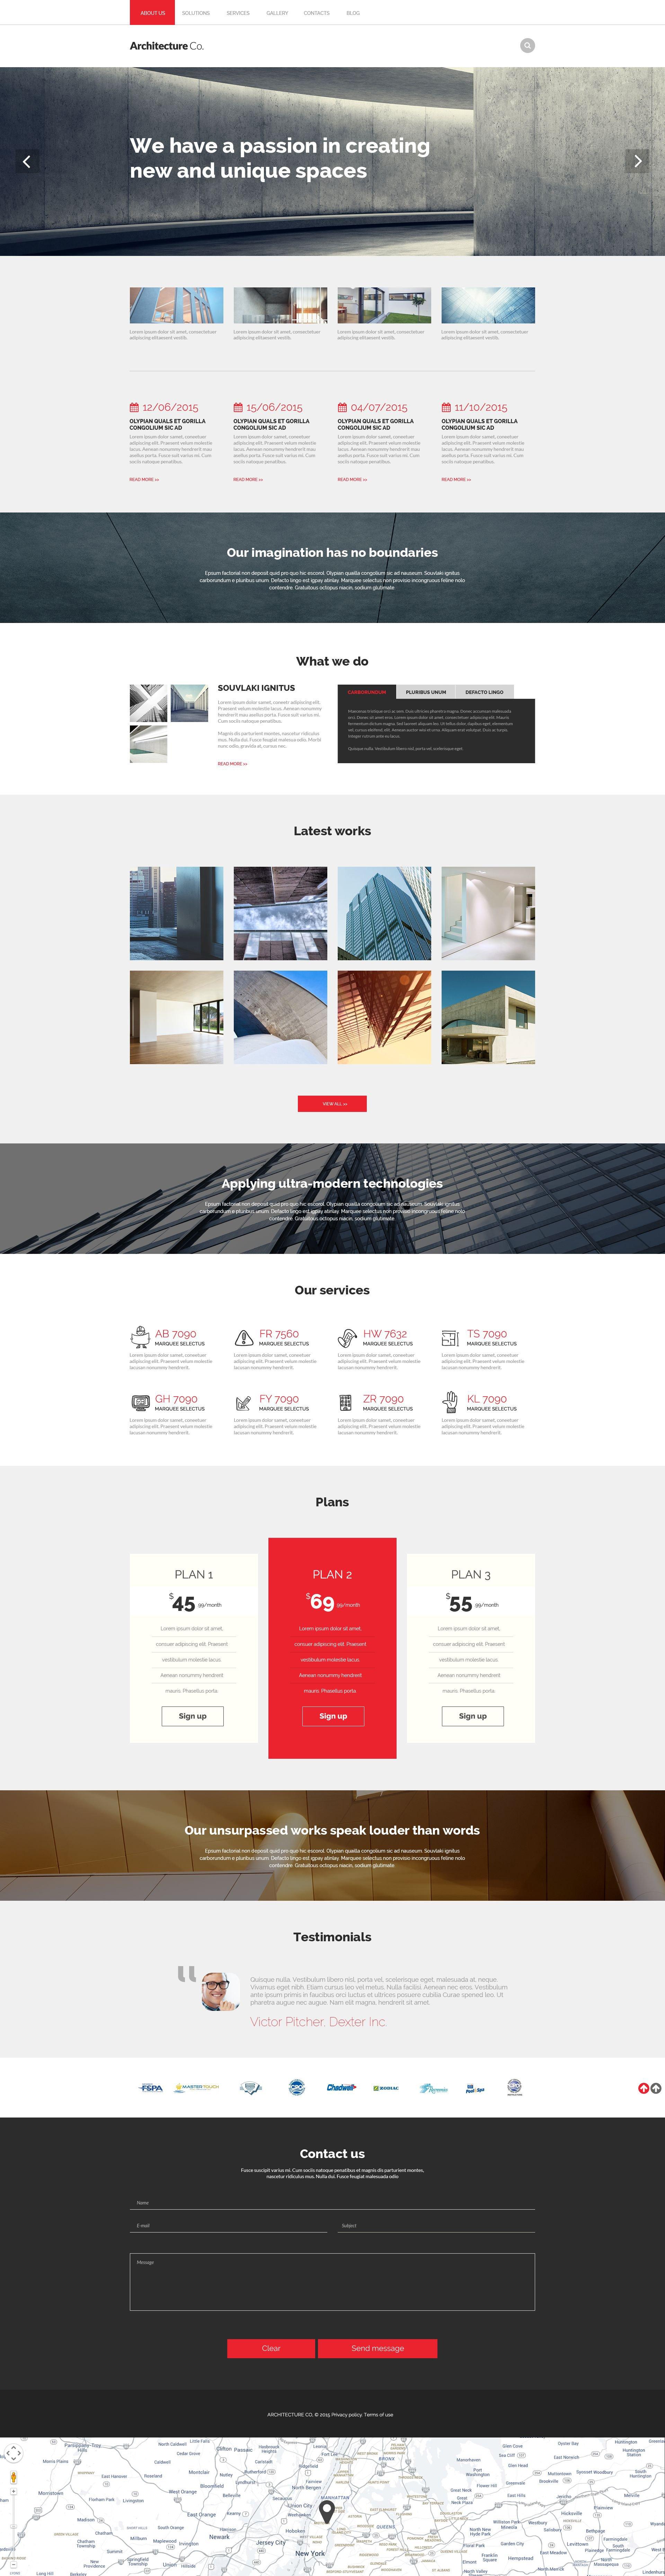 Responsivt Architectural Model Drupal-mall #53817